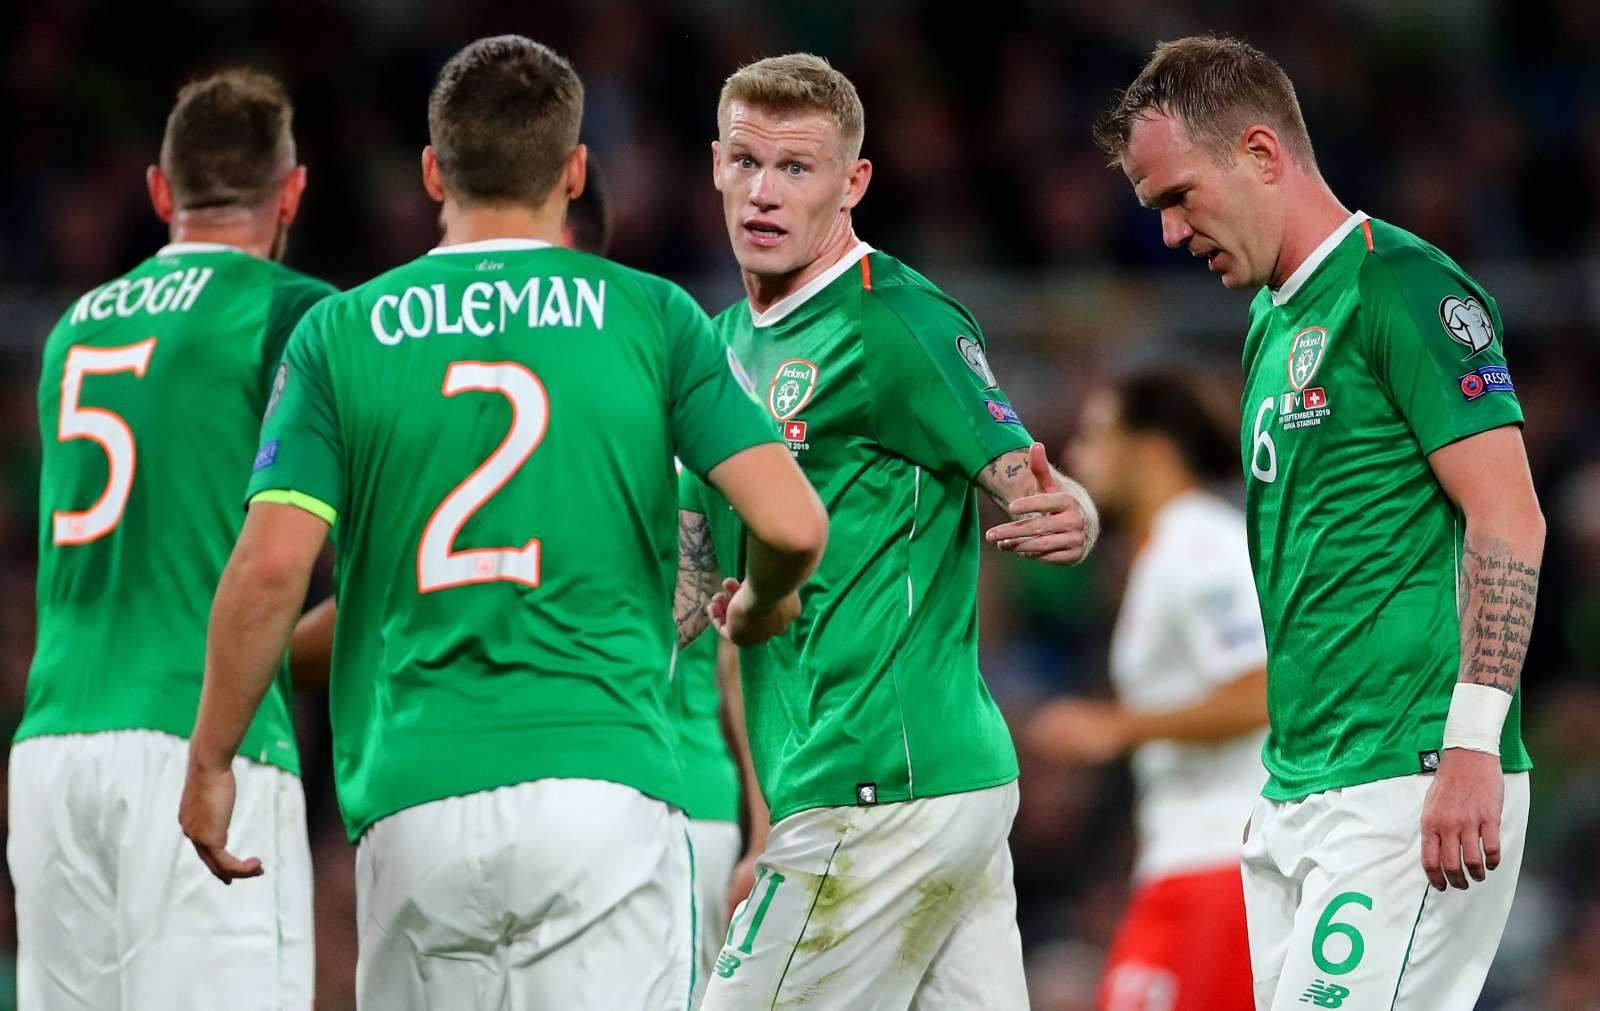 Ирландия – Азербайджан: прогноз на матч отборочного цикла чемпионата мира-2022 - 4 сентября 2021